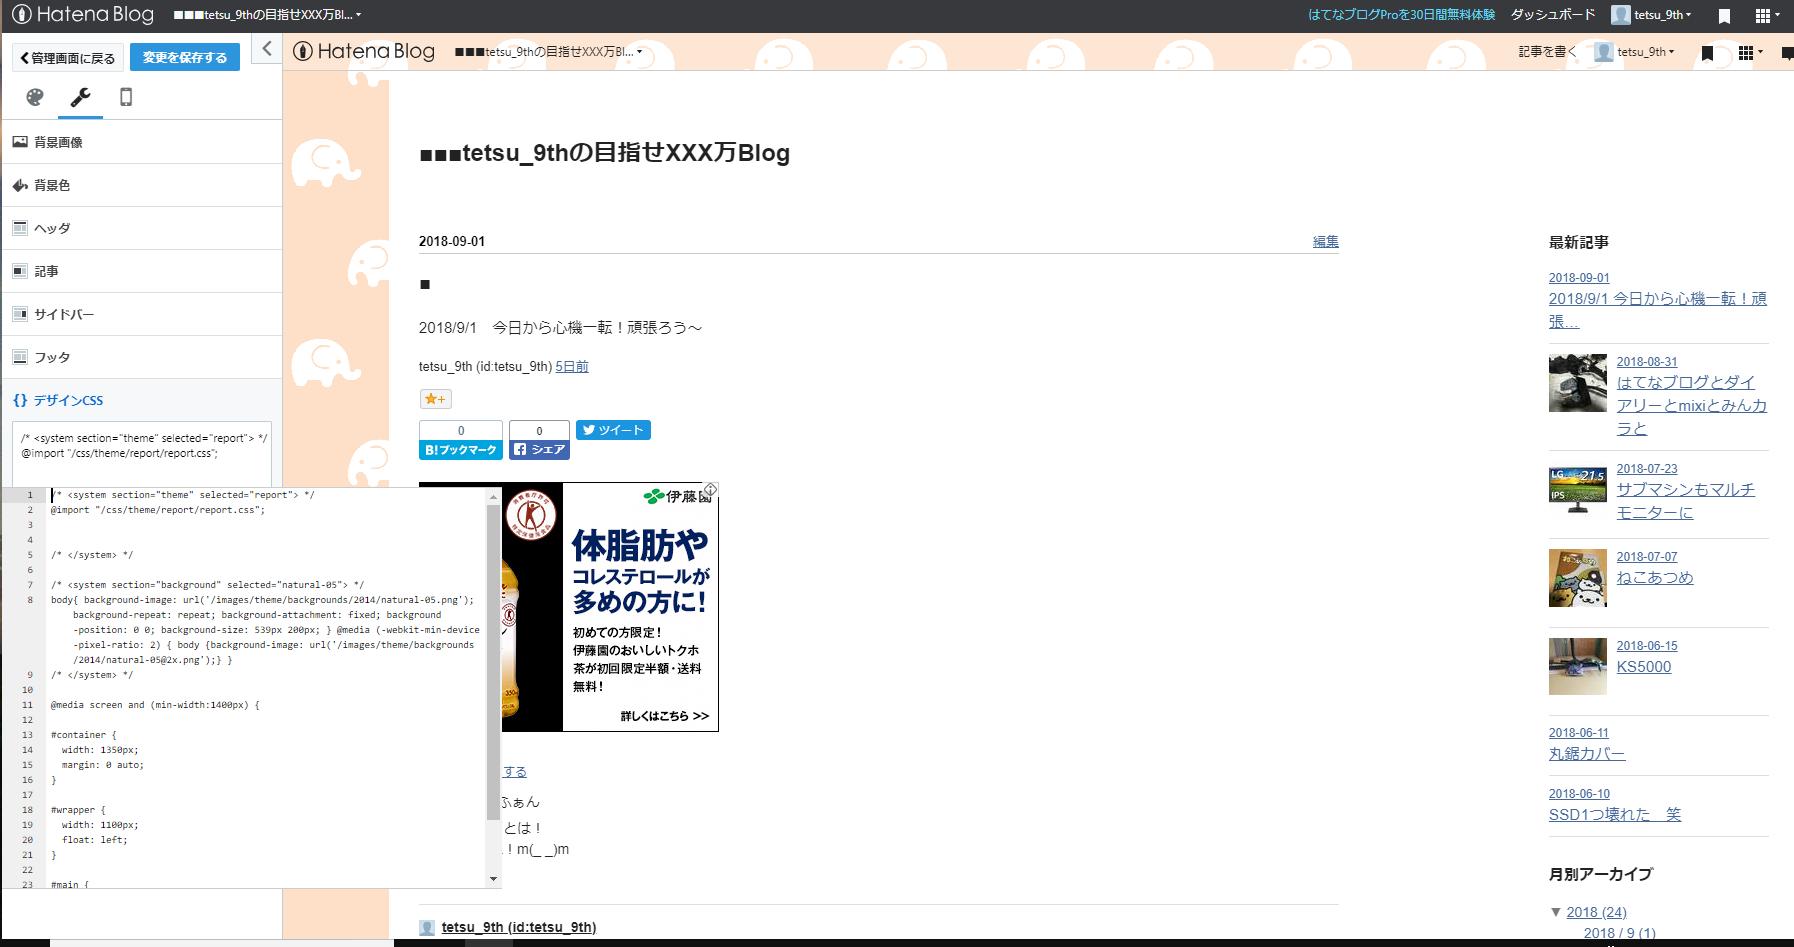 f:id:tetsu_9th:20180906193307p:image:w400